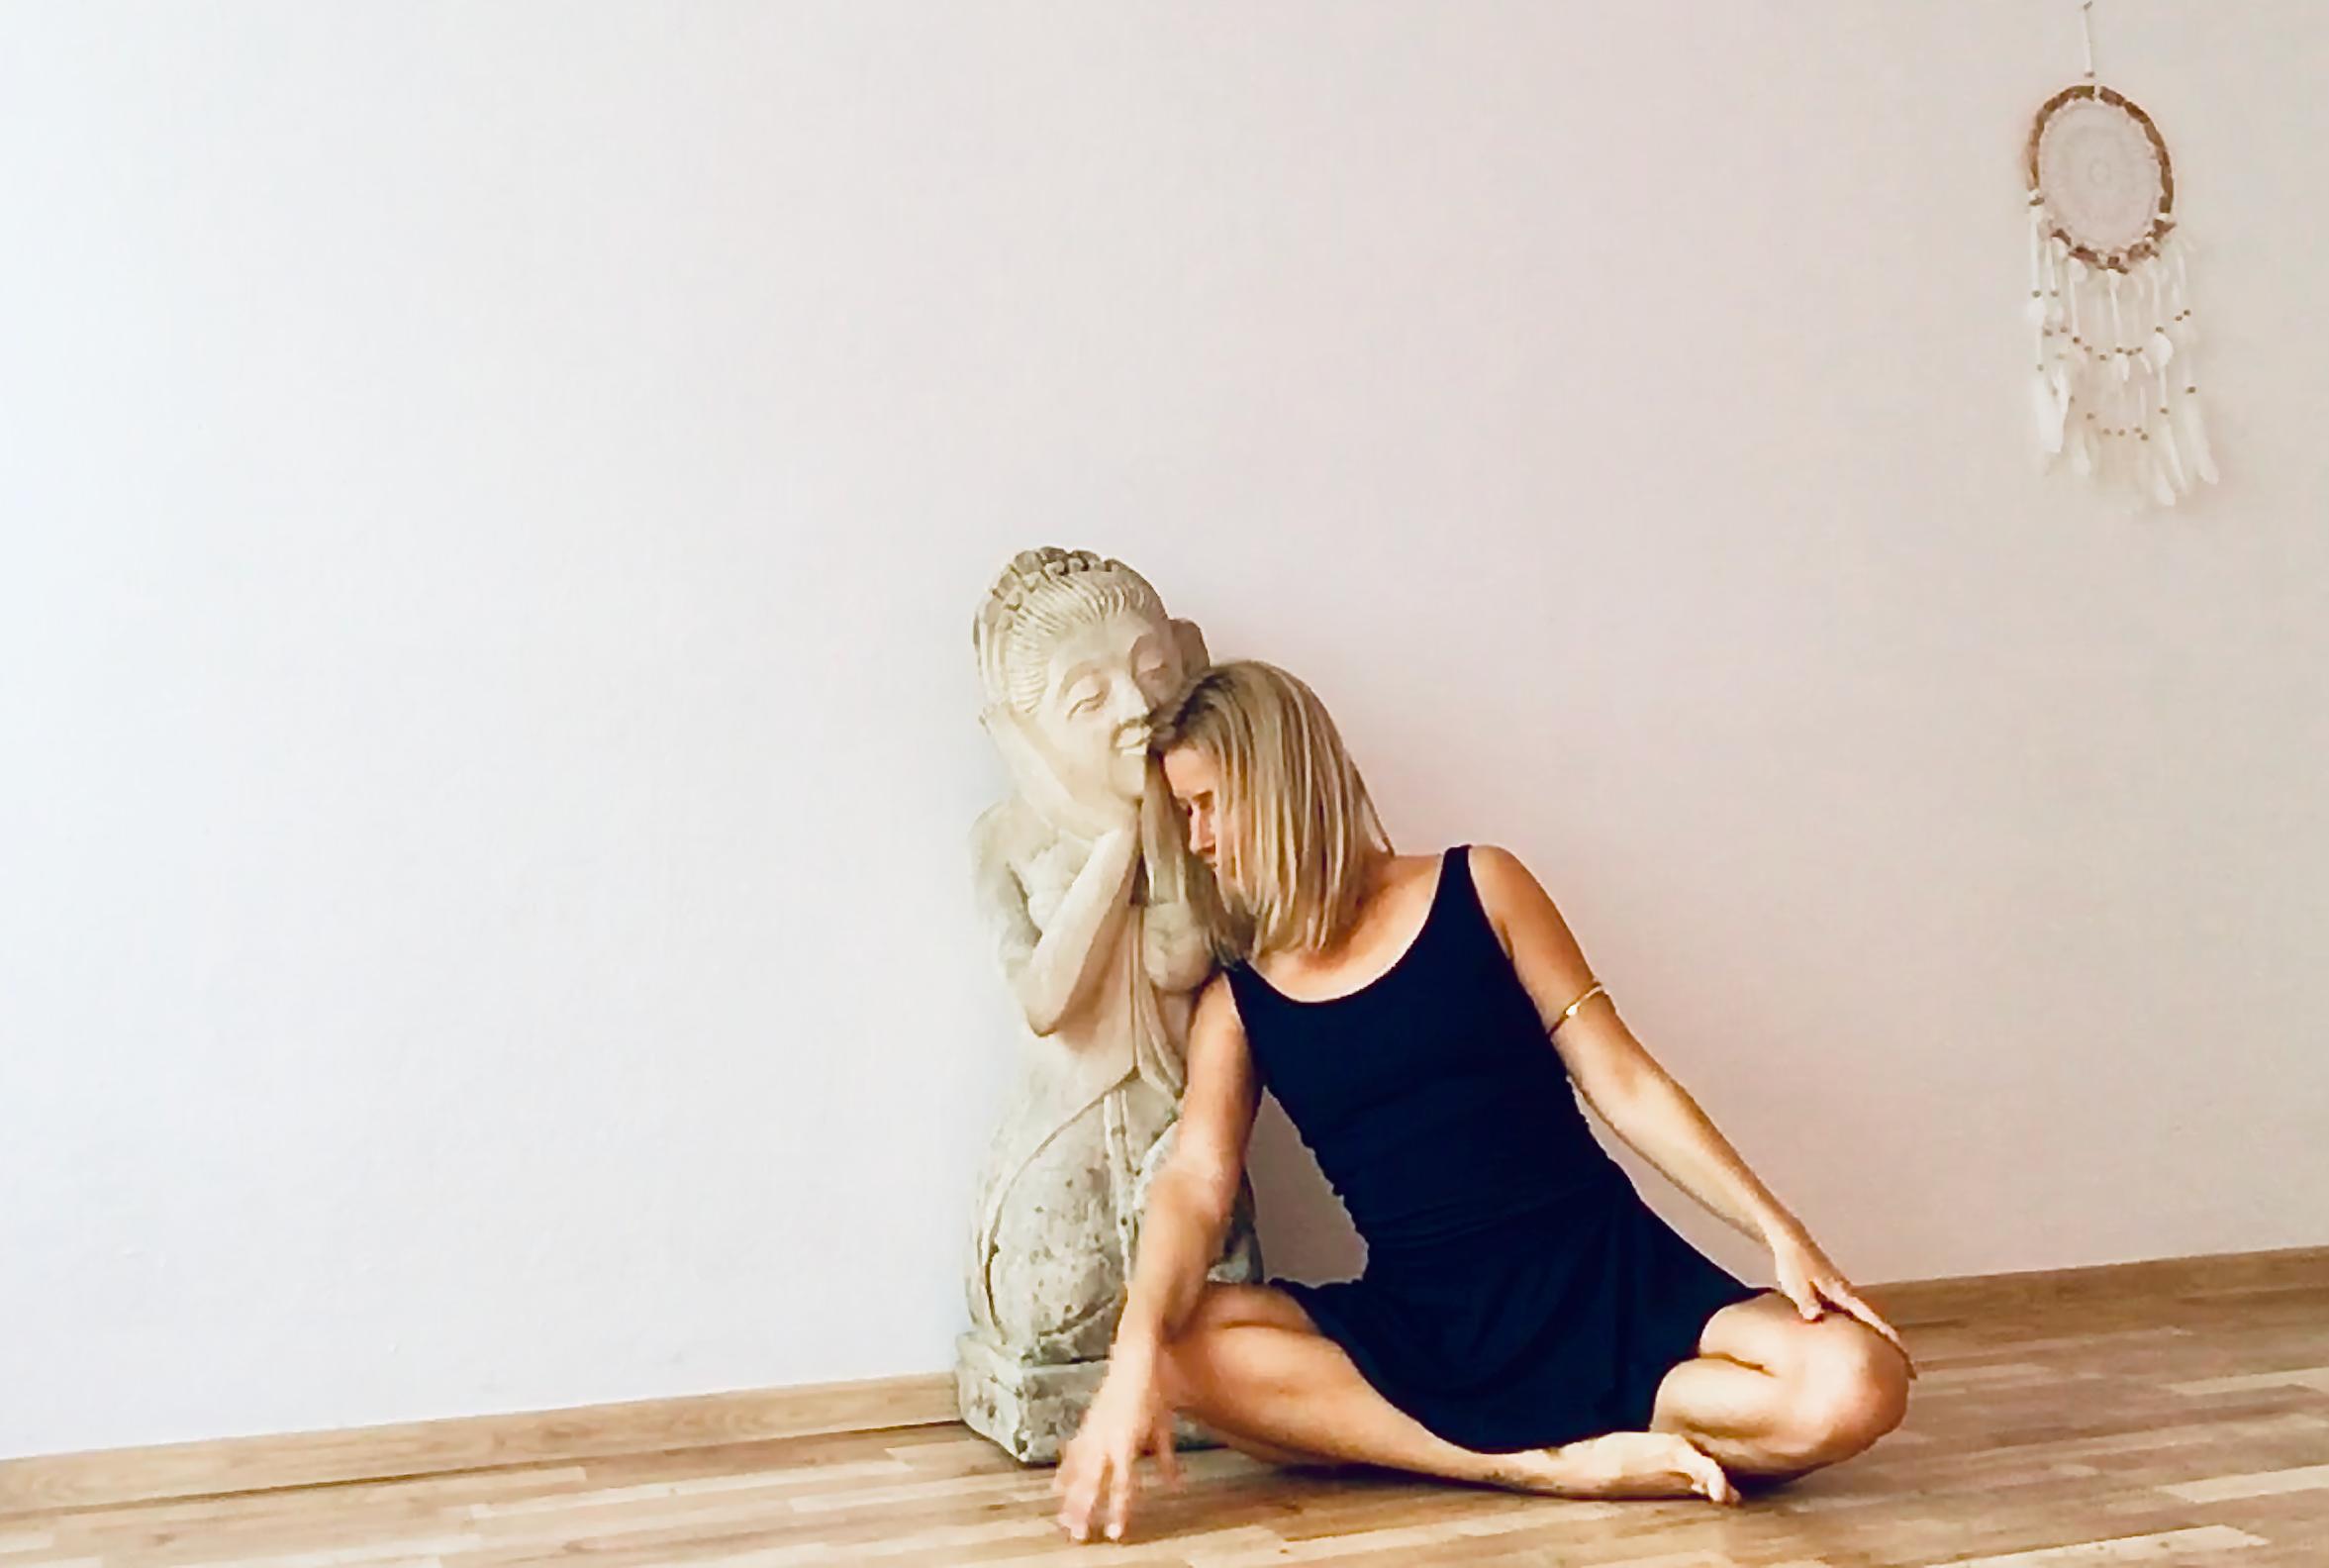 jogove-saty-trust-your-intuition-by-judita-berkova-na-milujeme-jogu